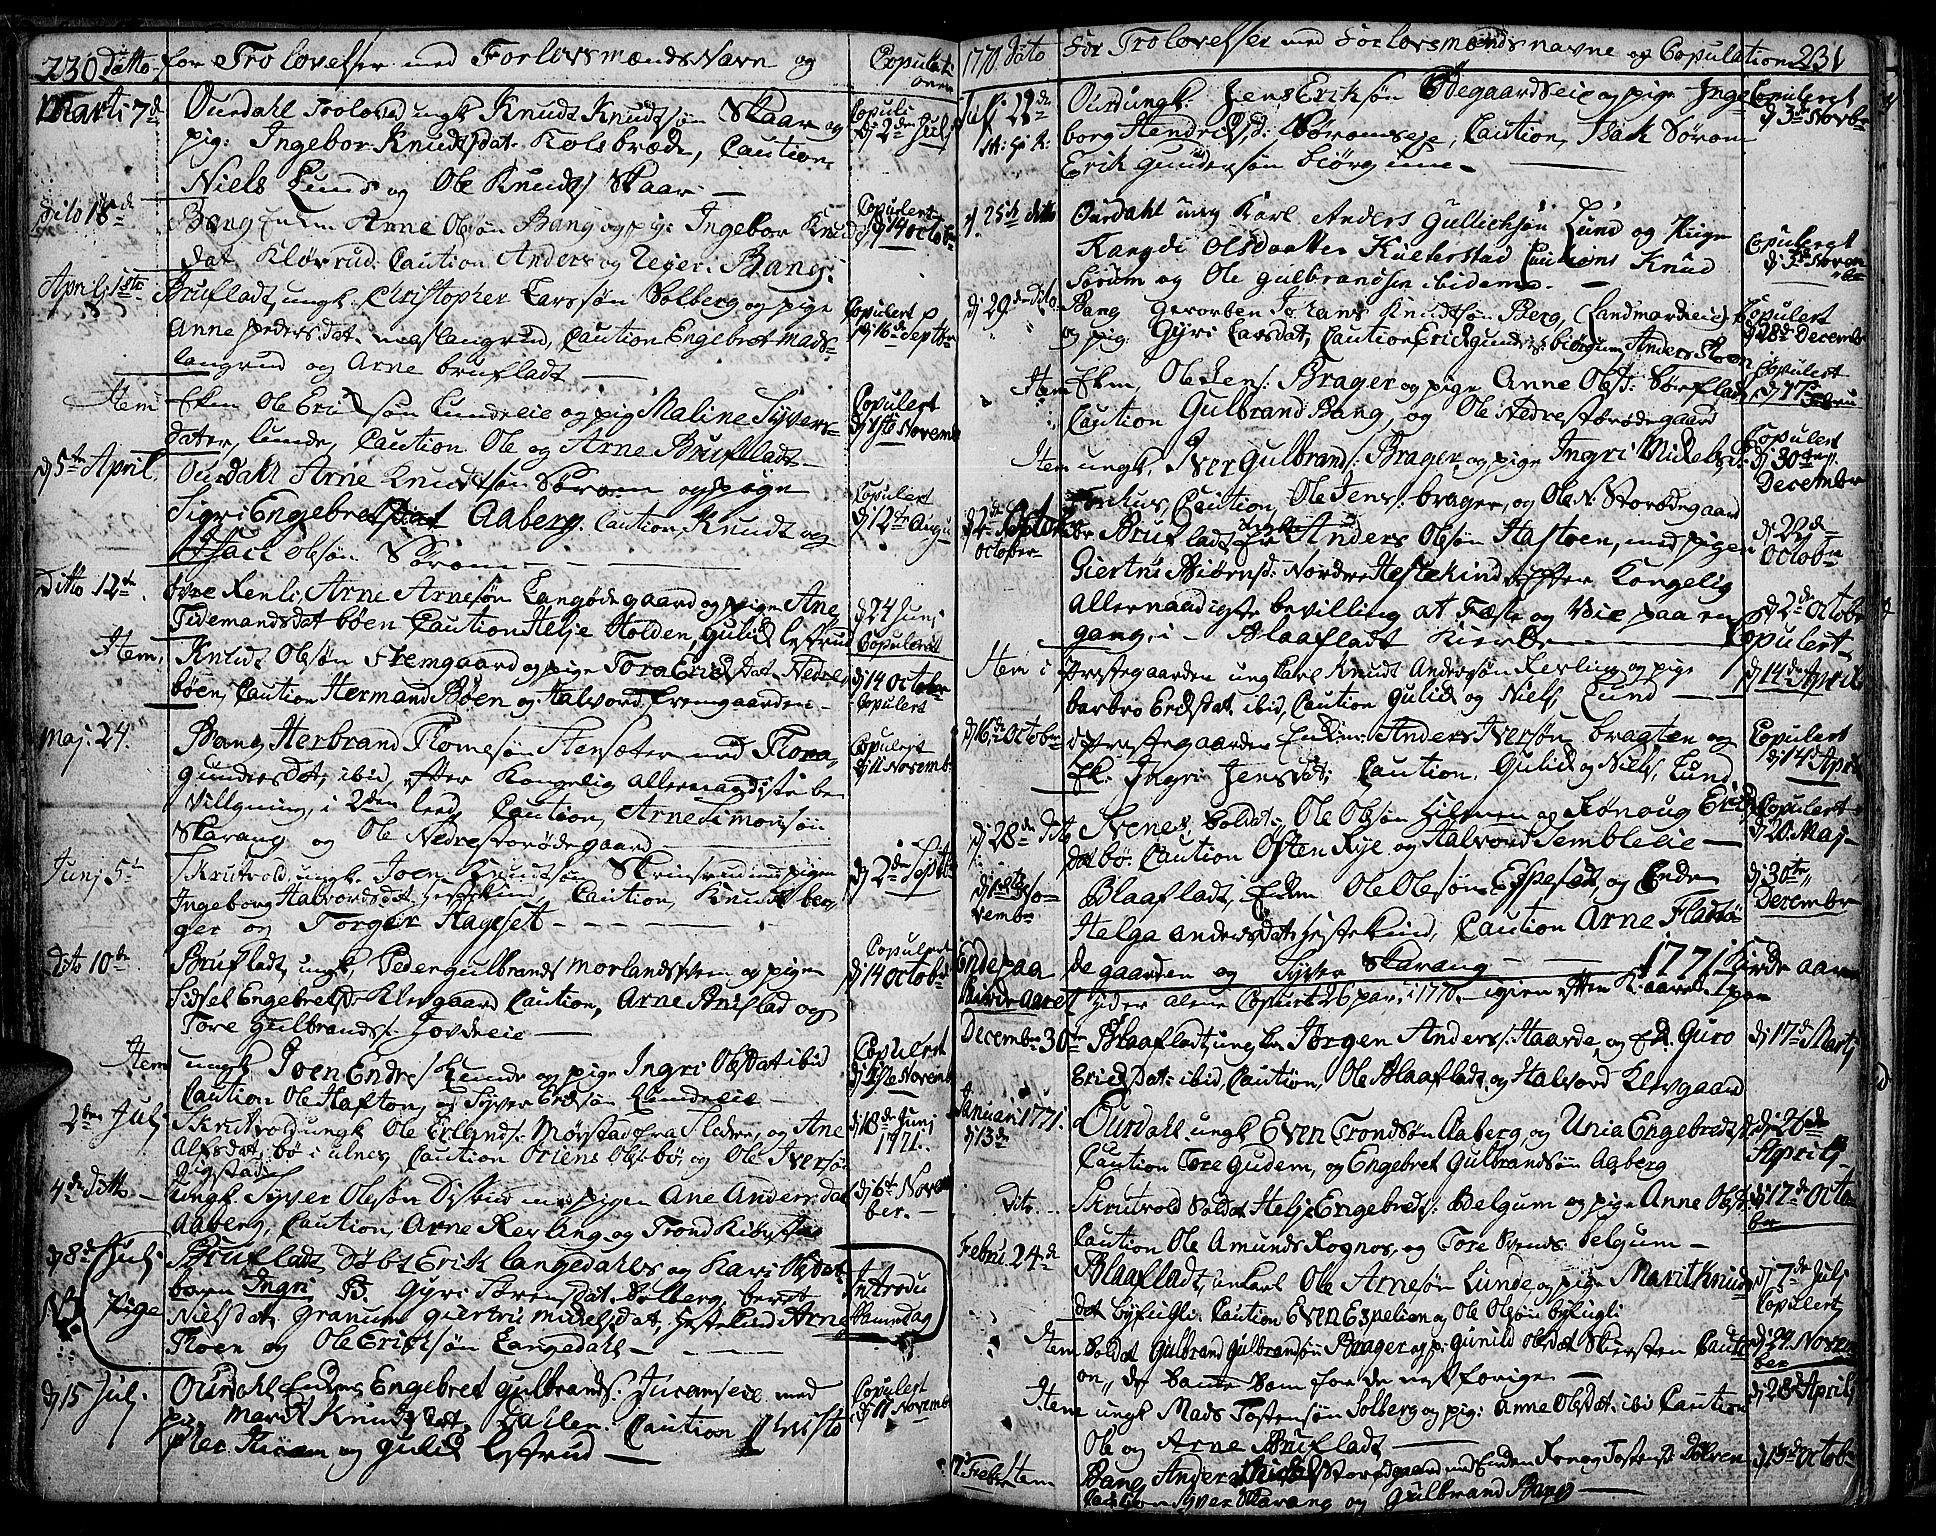 SAH, Aurdal prestekontor, Ministerialbok nr. 5, 1763-1781, s. 230-231